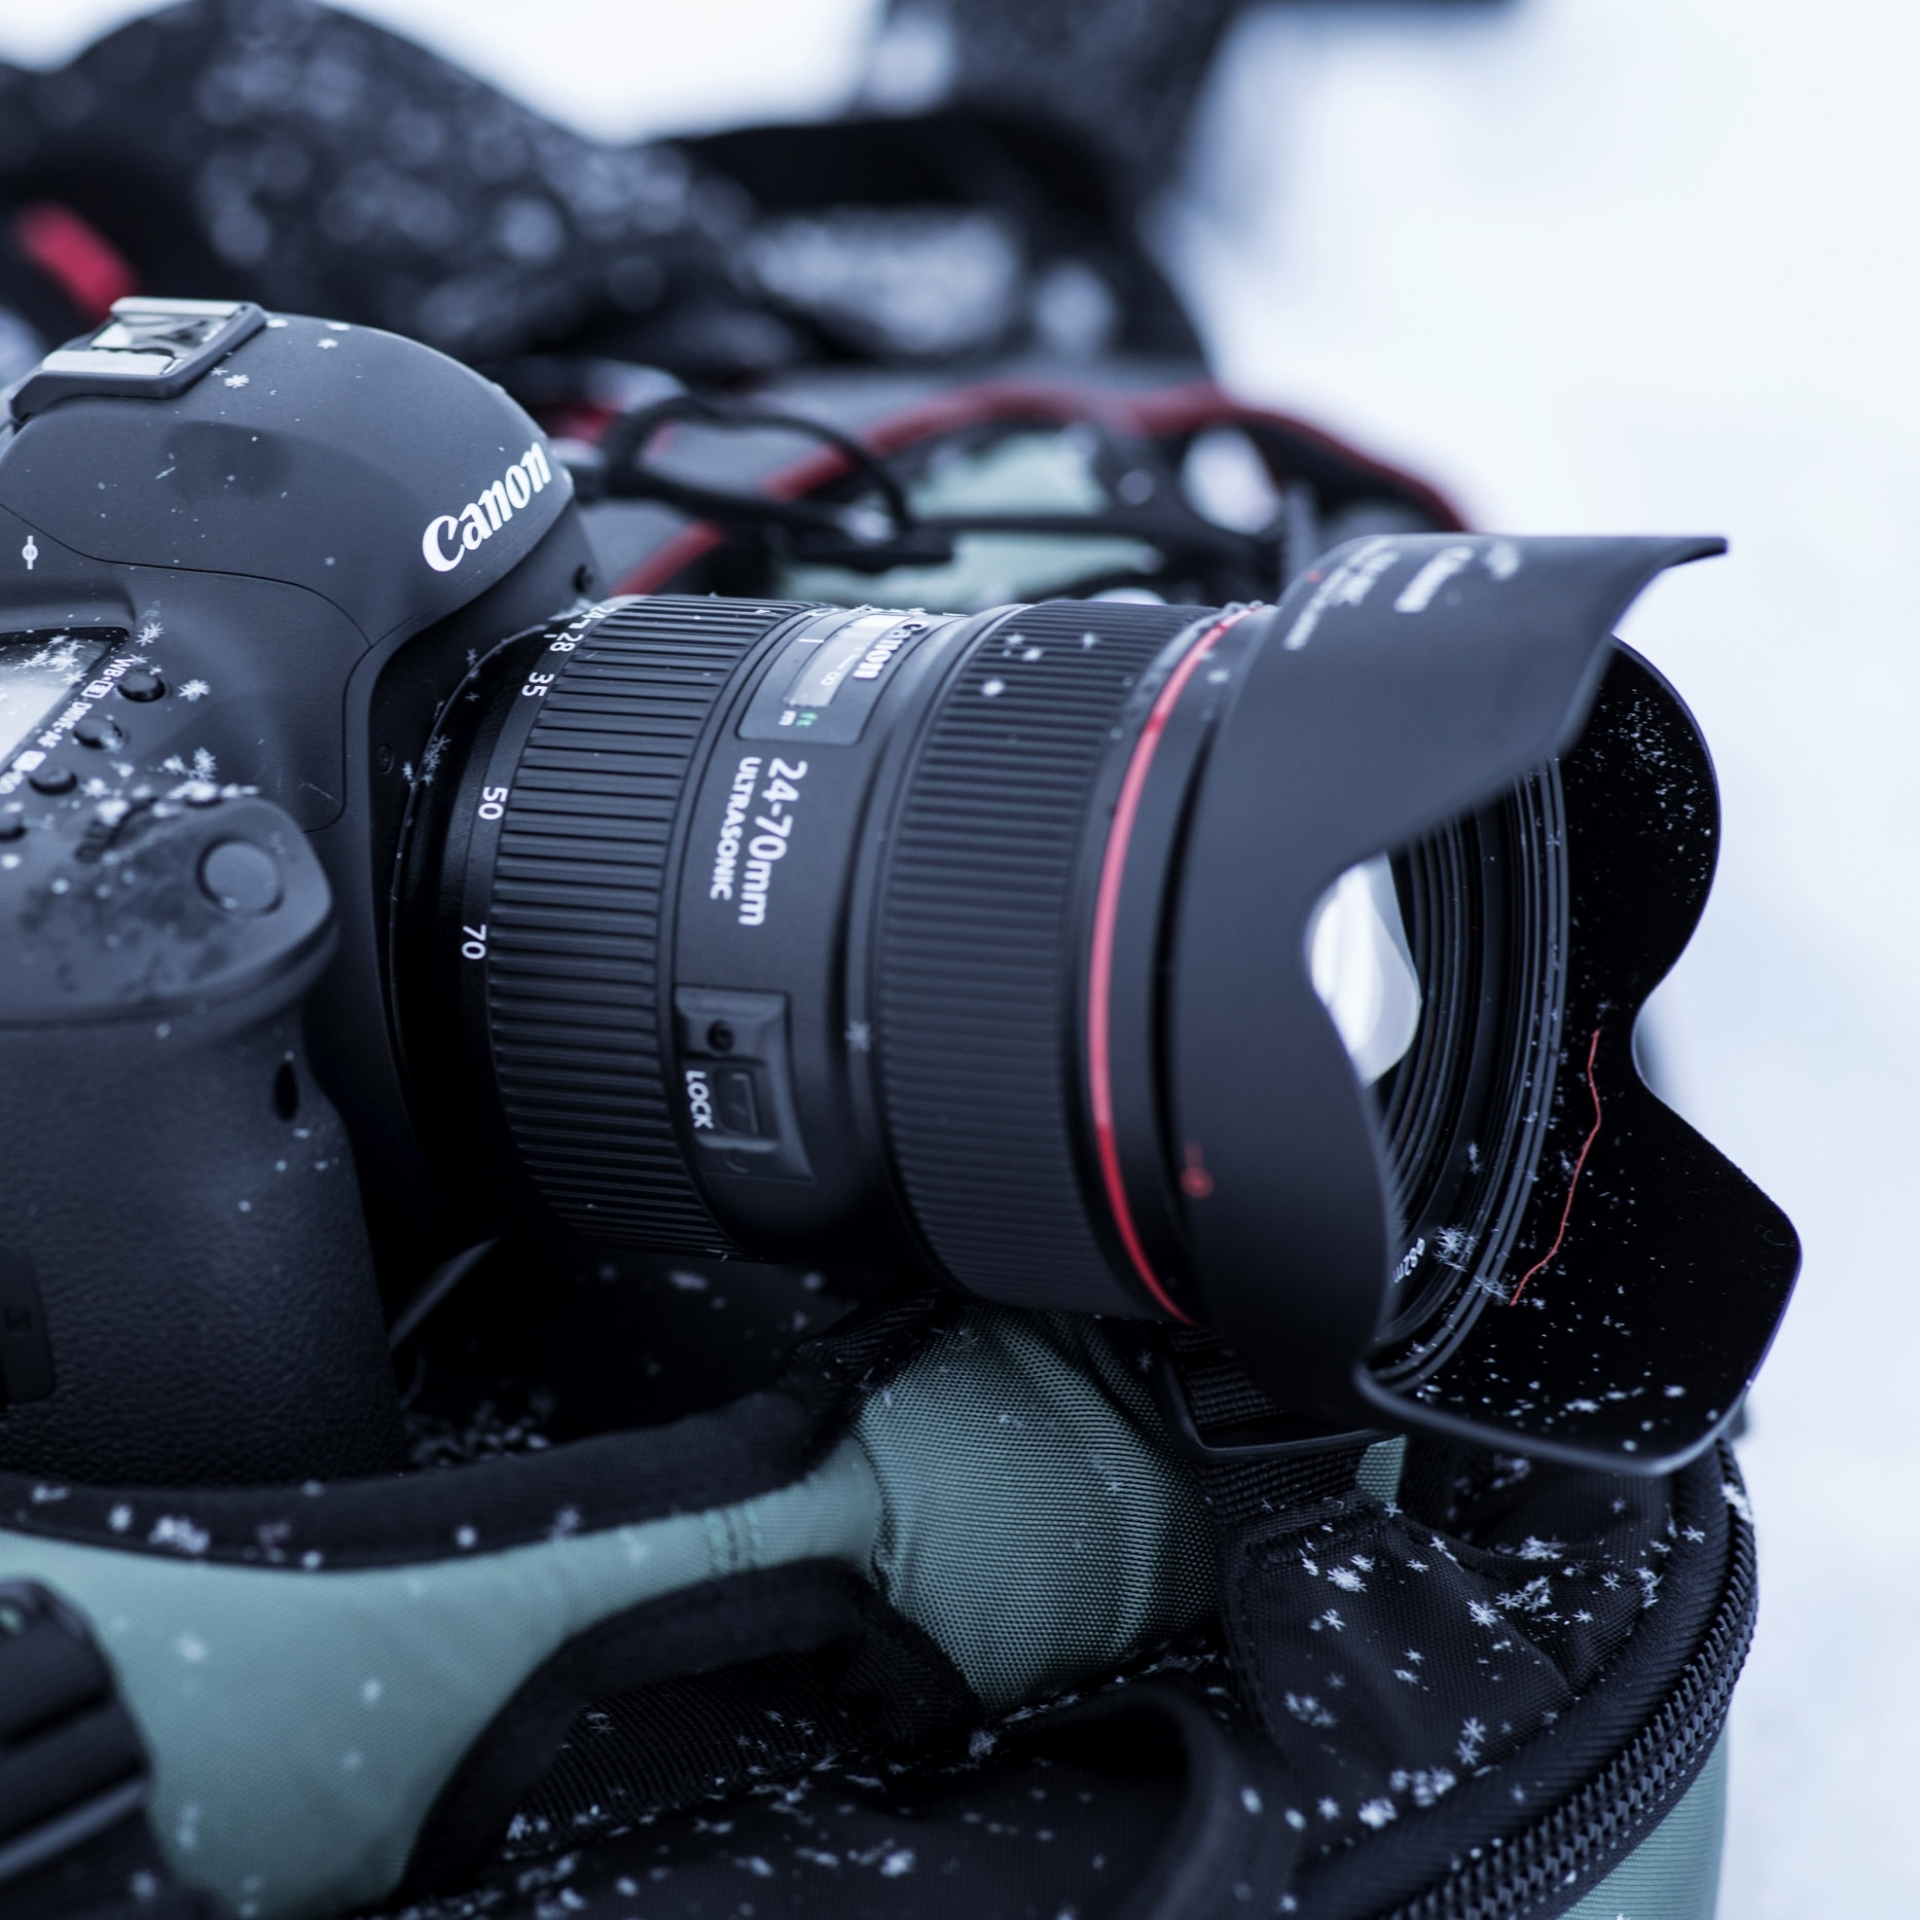 Standard-Zoomobjektiv Canon EF 24-70mm f/2.8L IS USM, Winter, Foto, Kamera